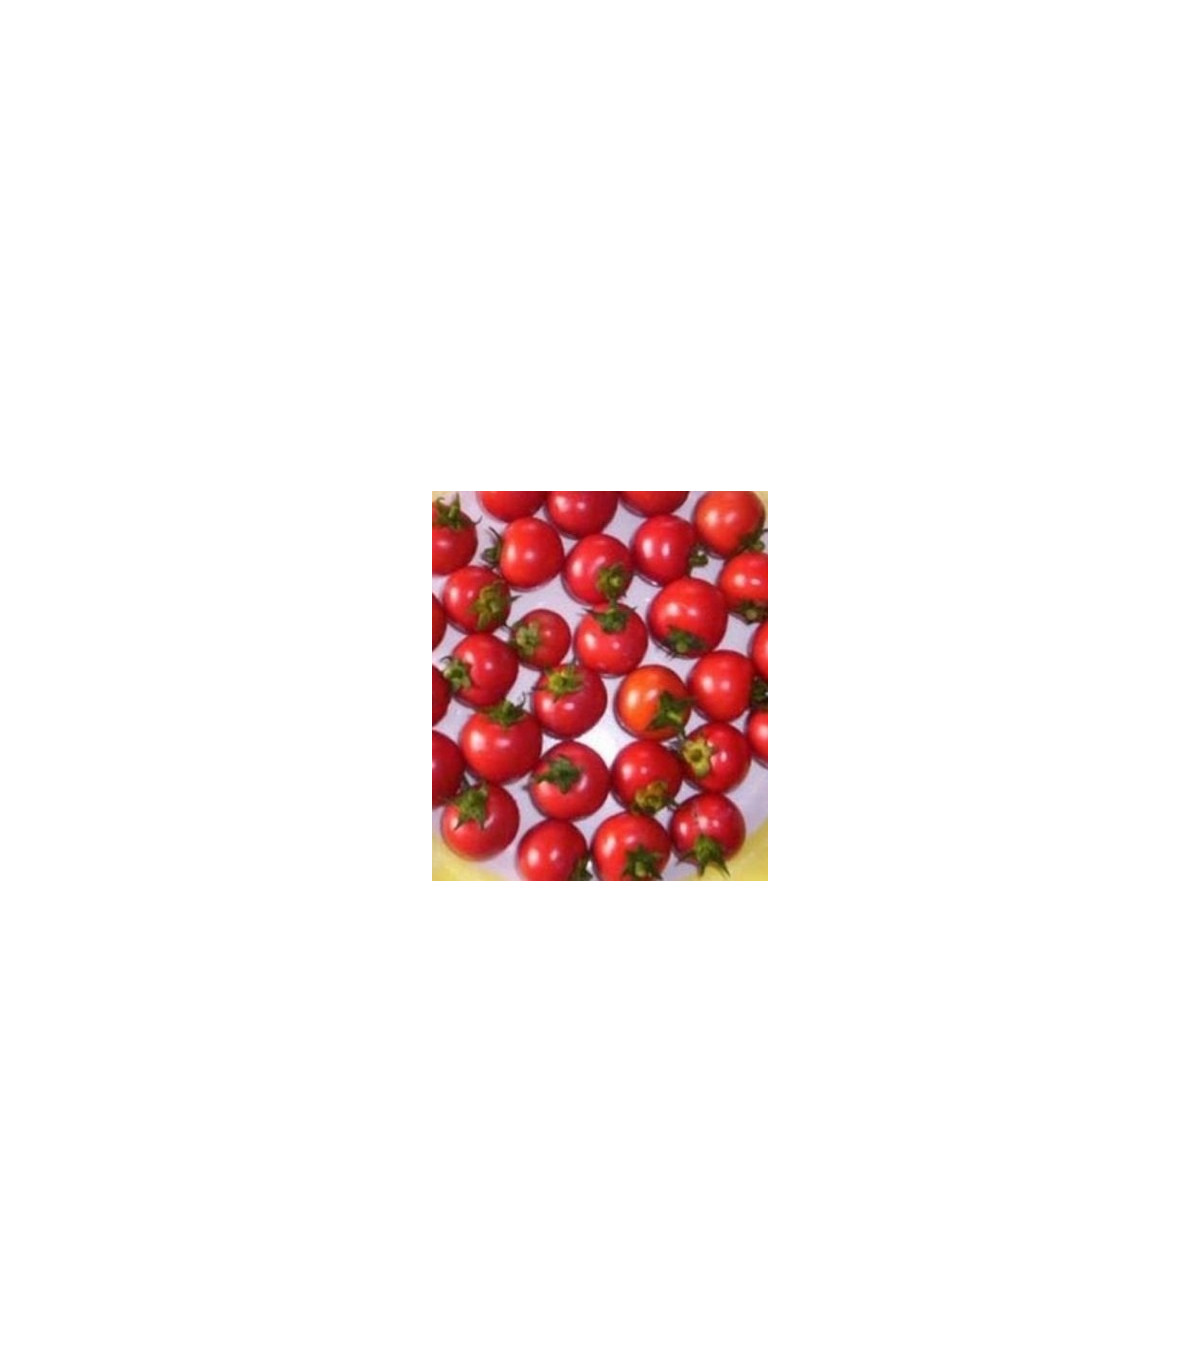 Rajče koktejlové Bistro - semena Rajčat - 15 ks